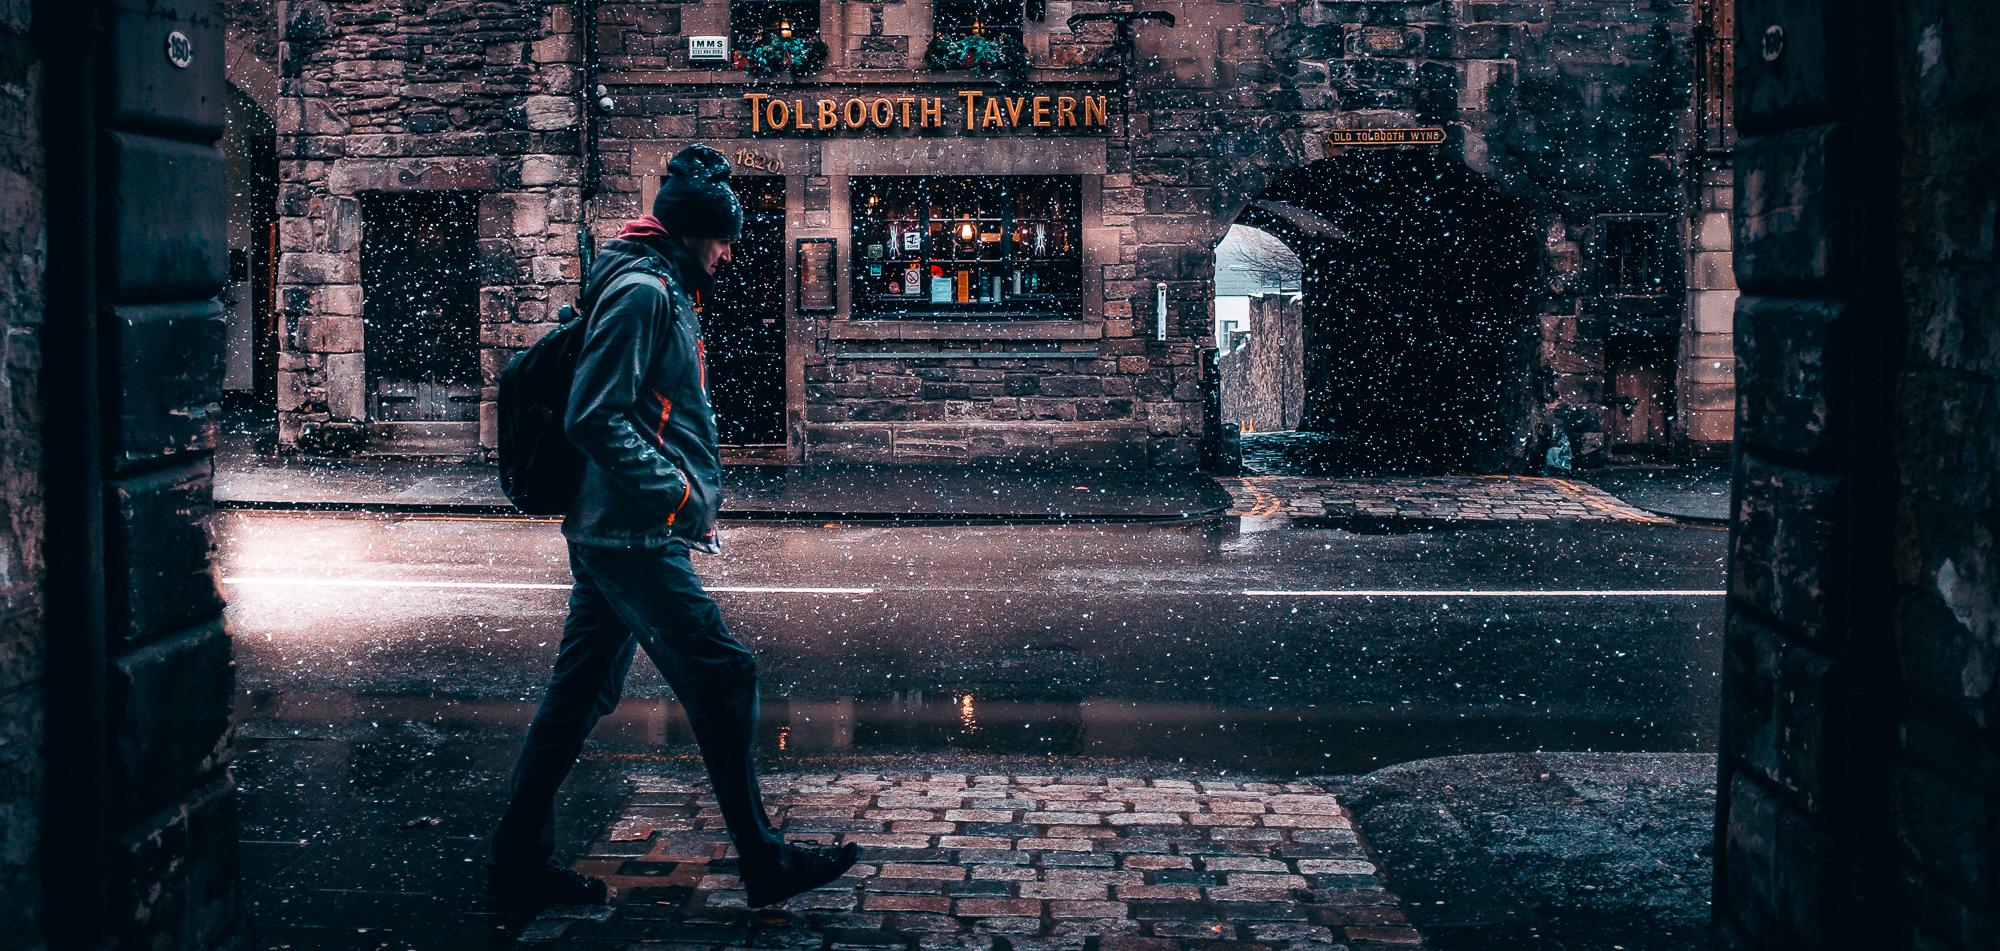 180121_Edinburgh in the Snow - Vlog_069.jpg